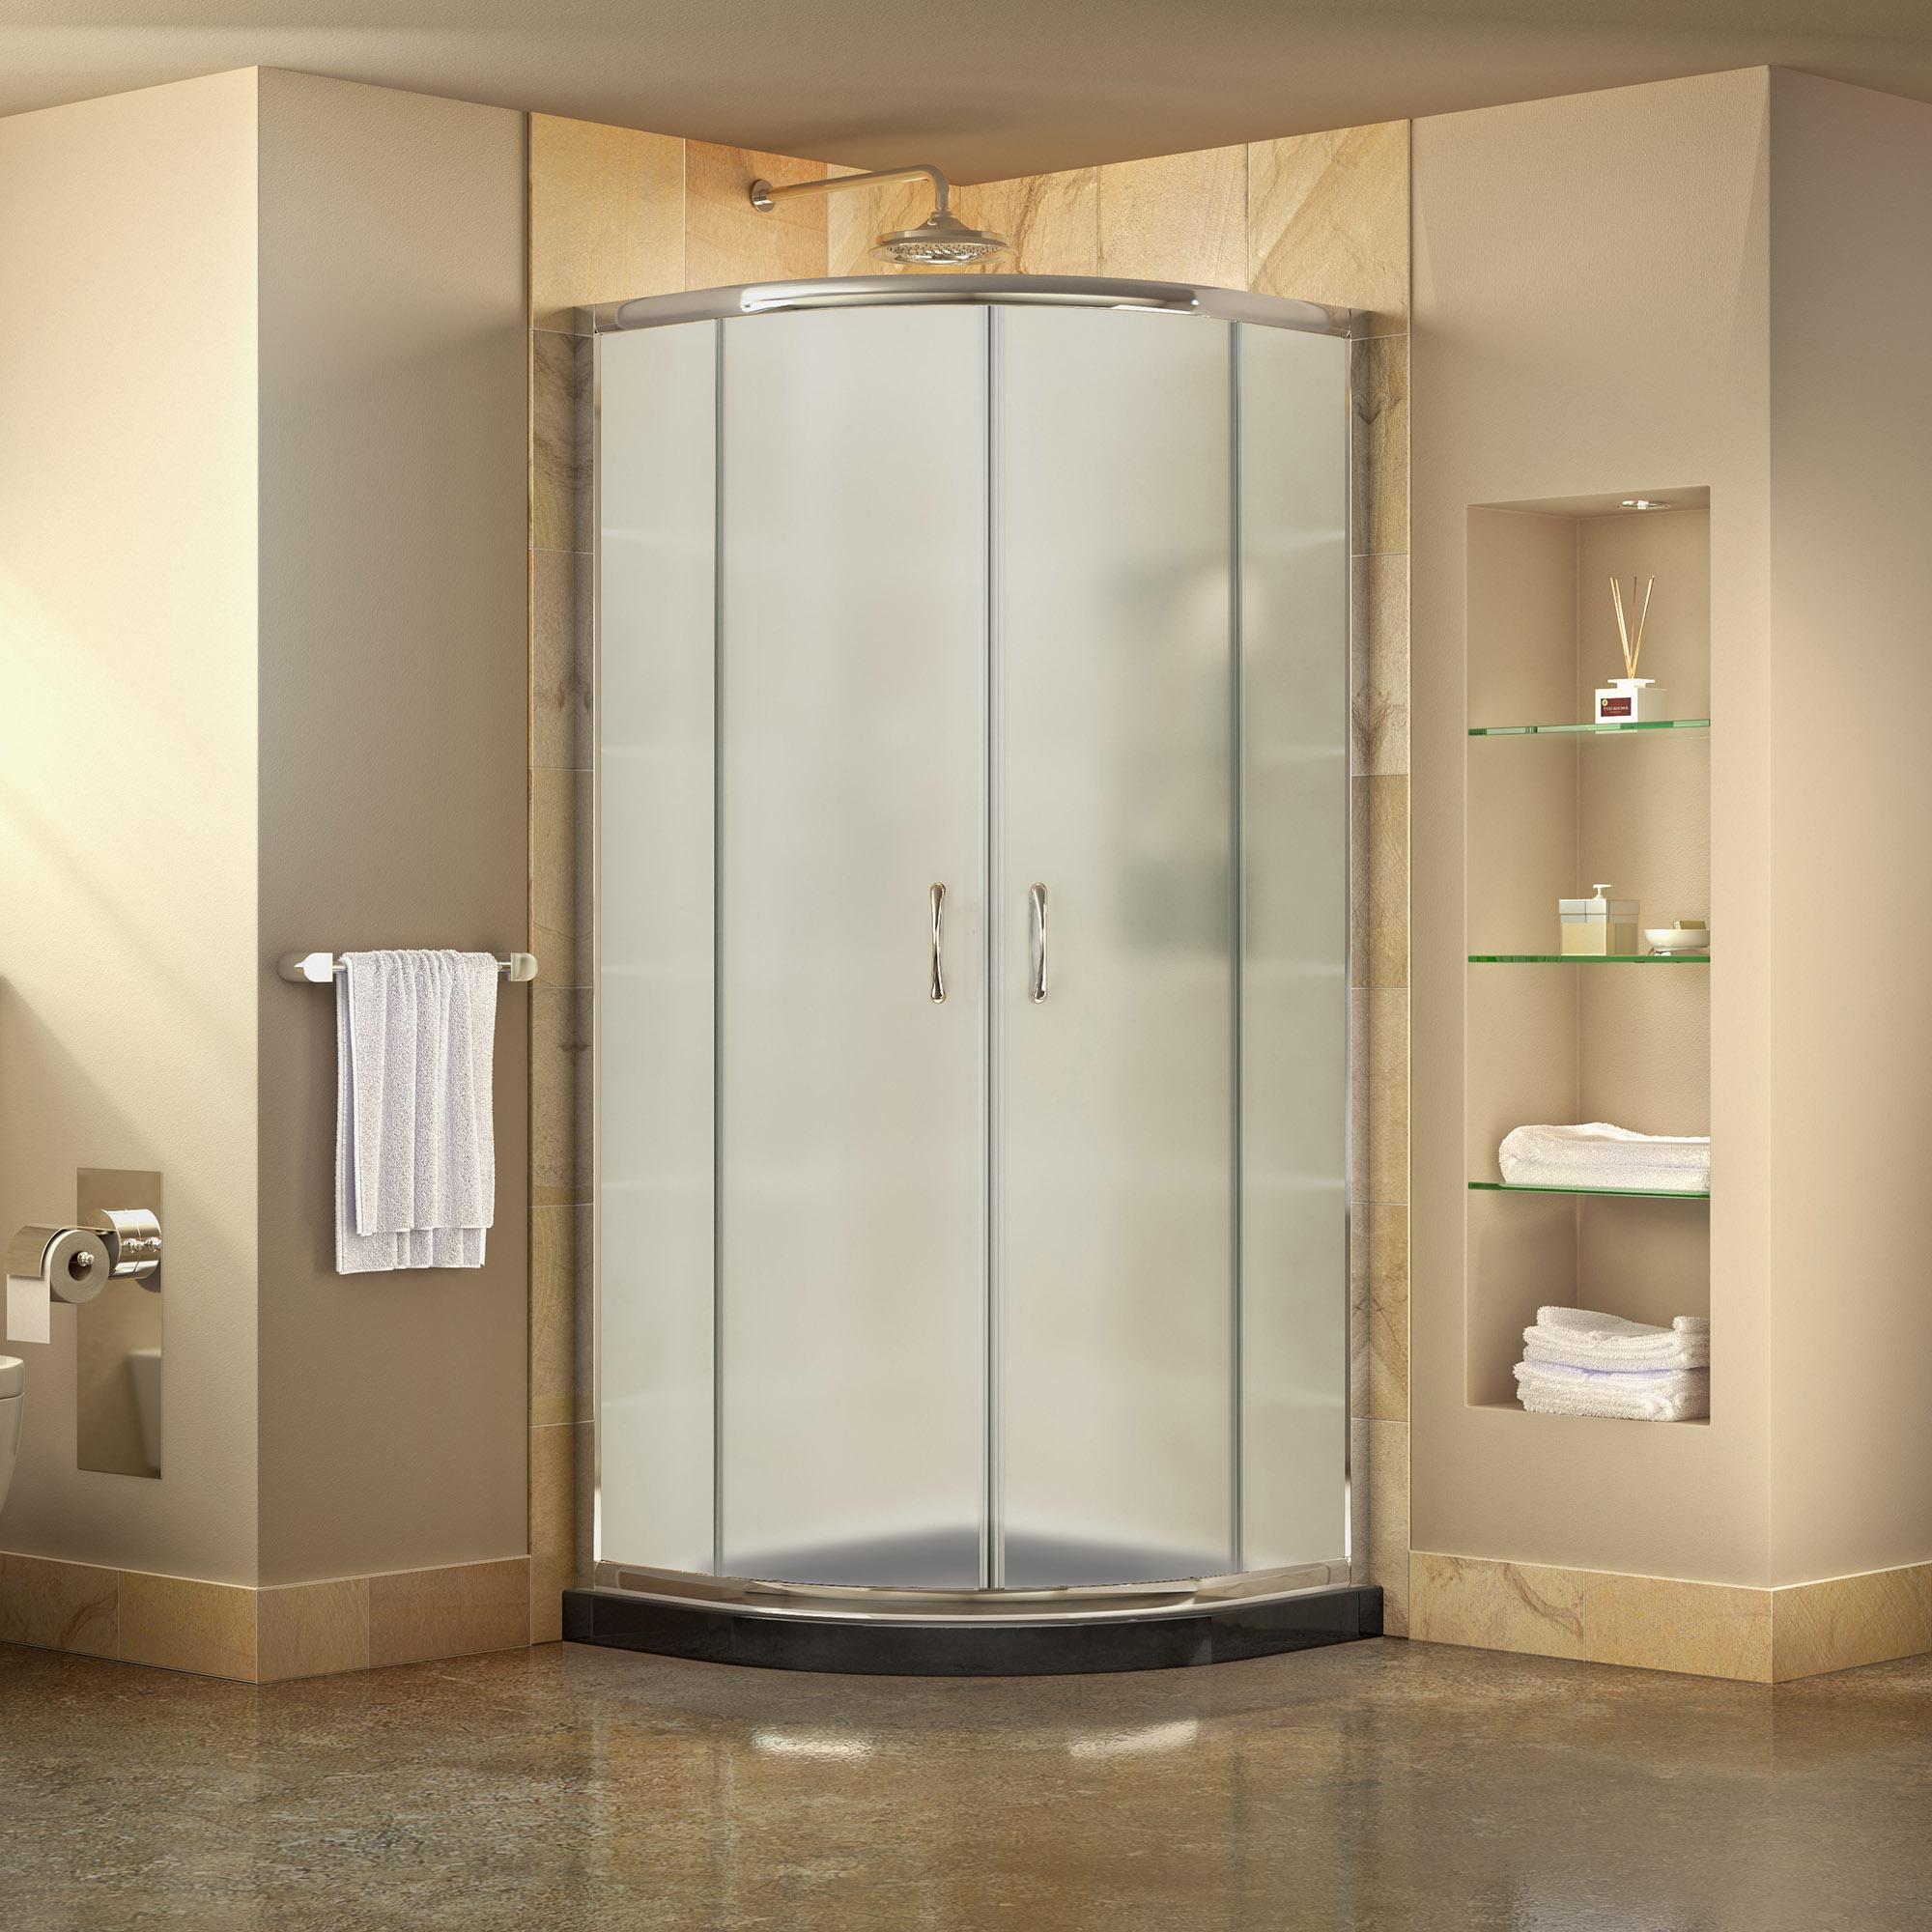 "Prime 34 3/8"" by 34 3/8"" Frameless Sliding Shower Enclosure, Base & QWALL-4 Shower Backwall Kit"